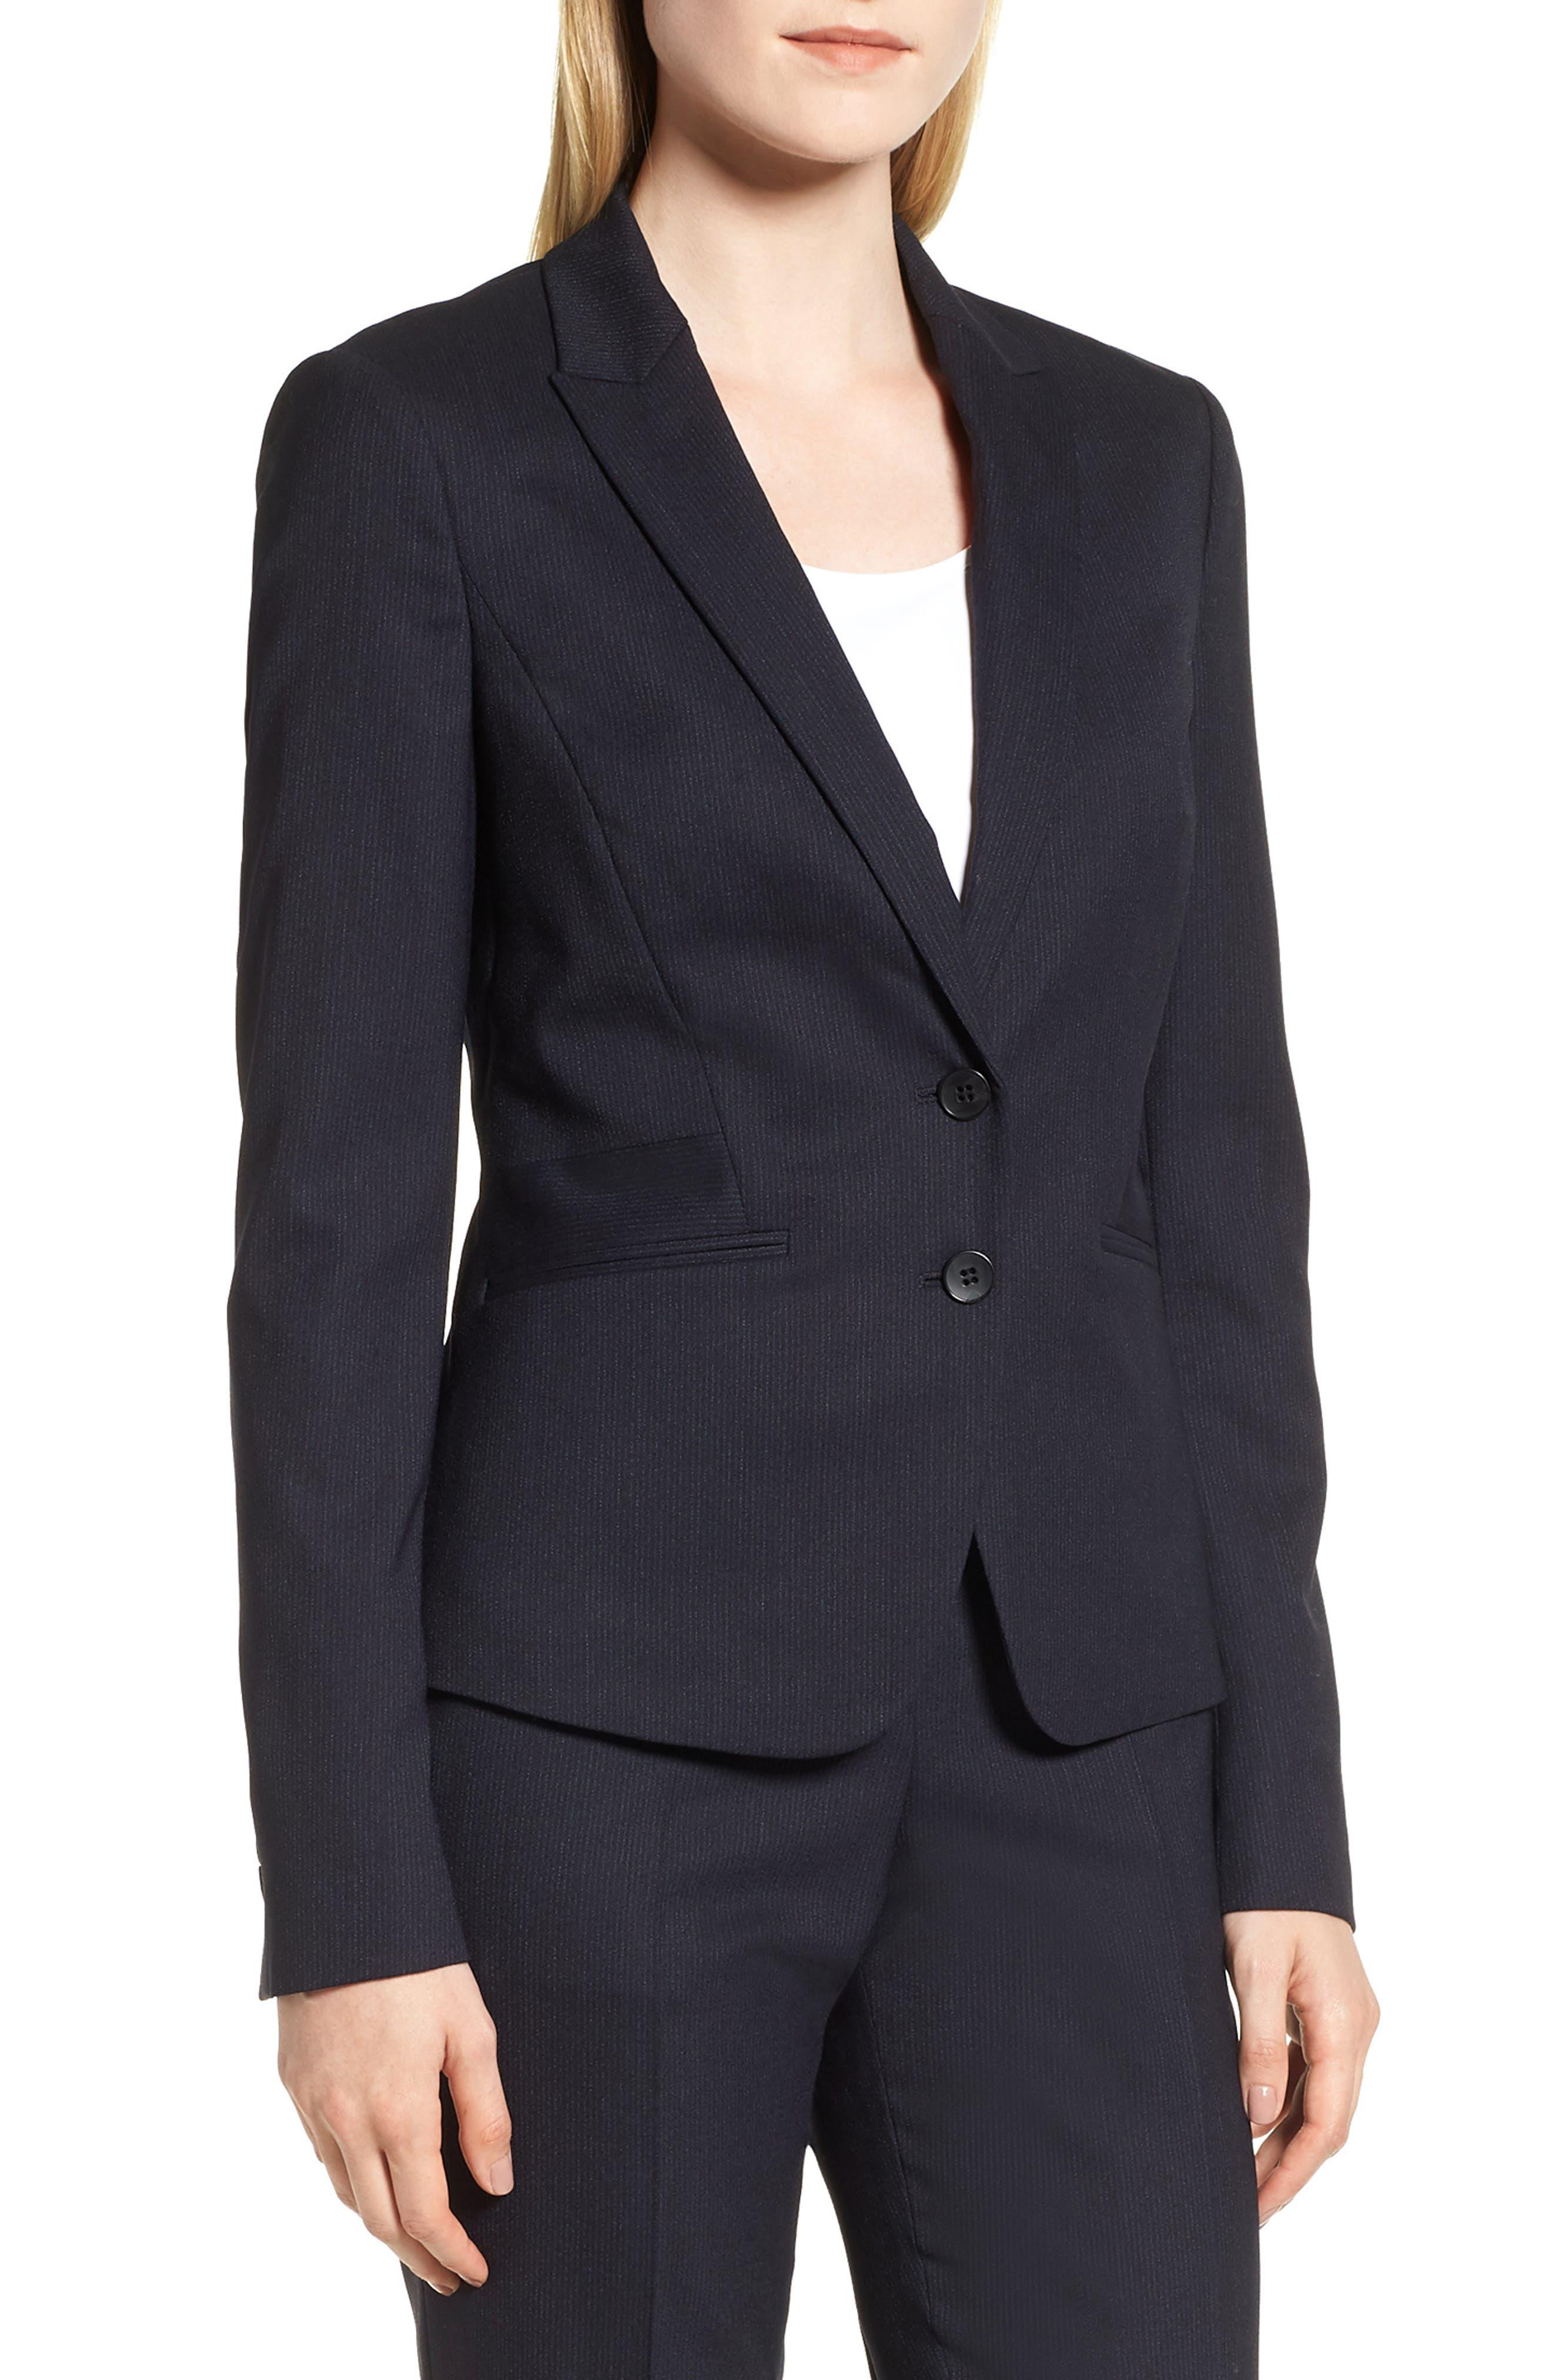 Jamahina Monostripe Stretch Wool Suit Jacket,                         Main,                         color, 468